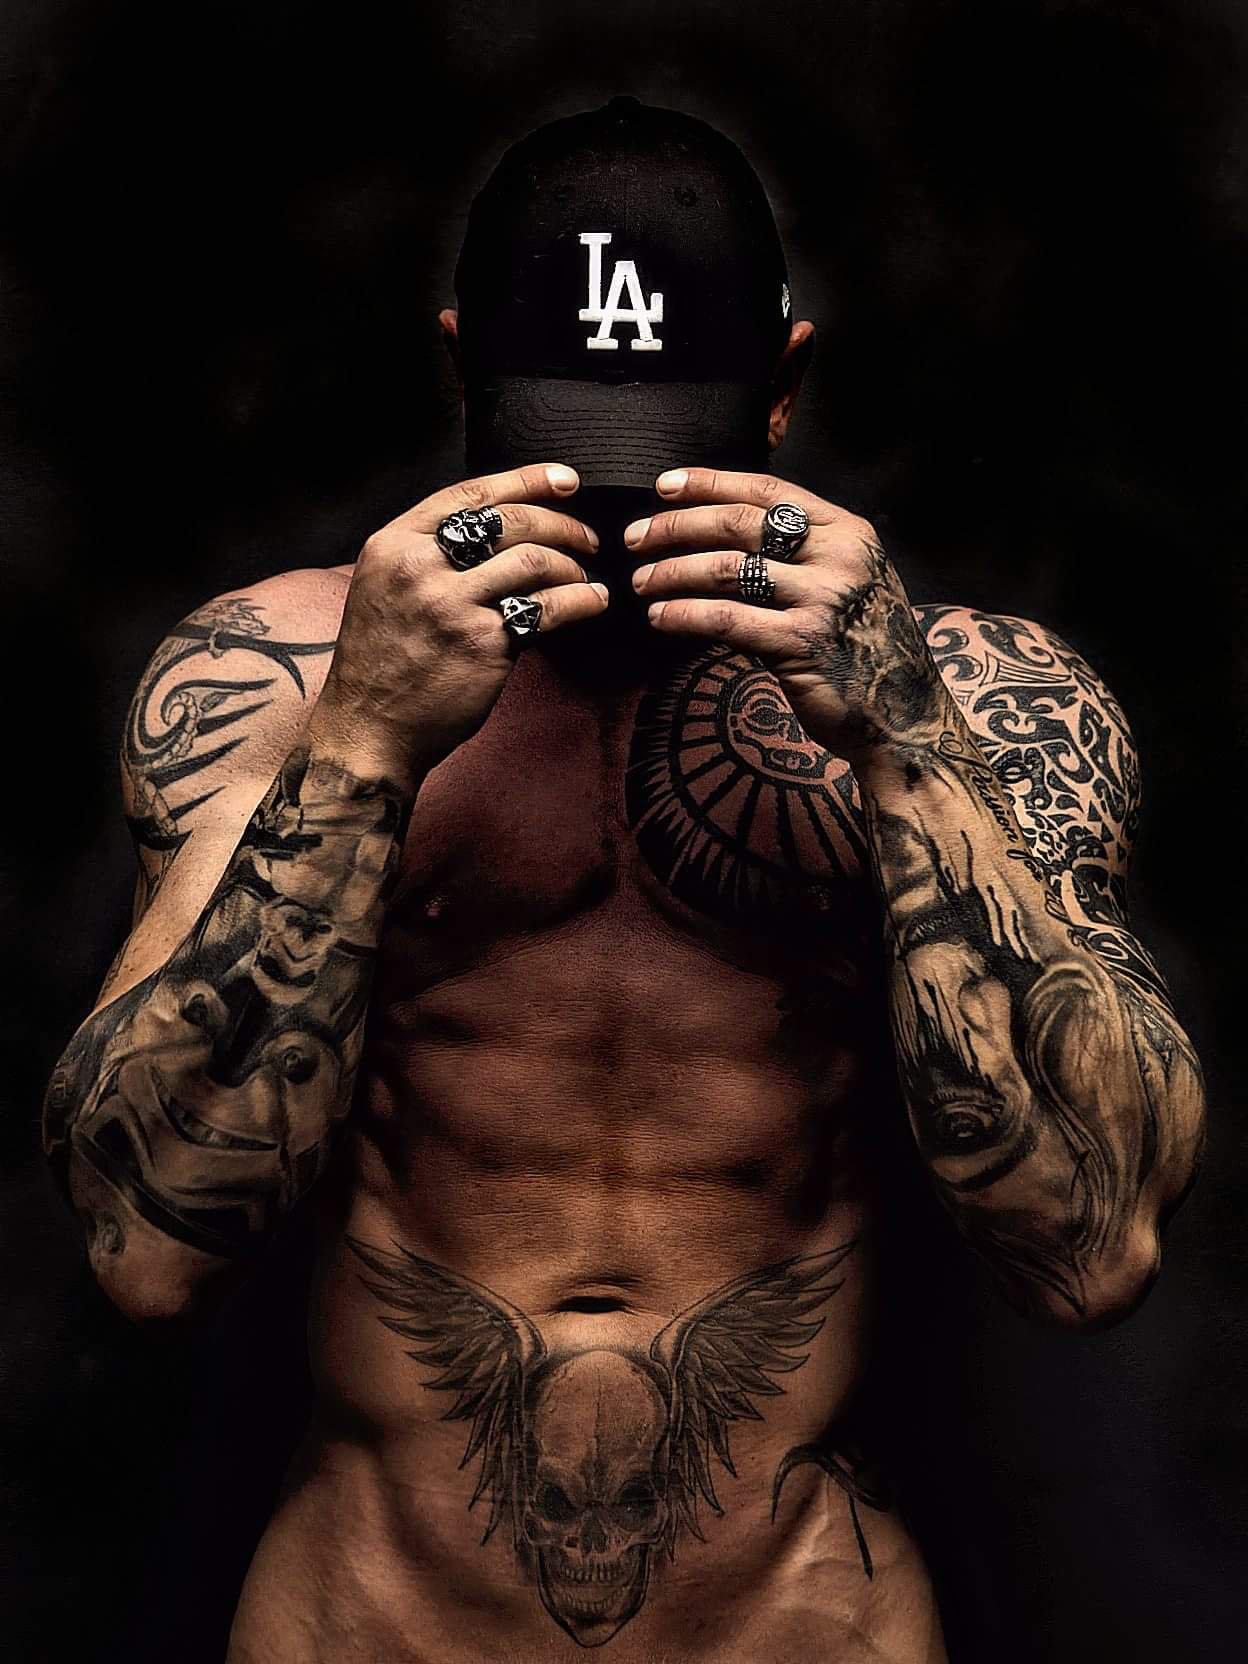 Pin By Julio Duran On Tattoos Pinterest Homme Tatoue Tatouage